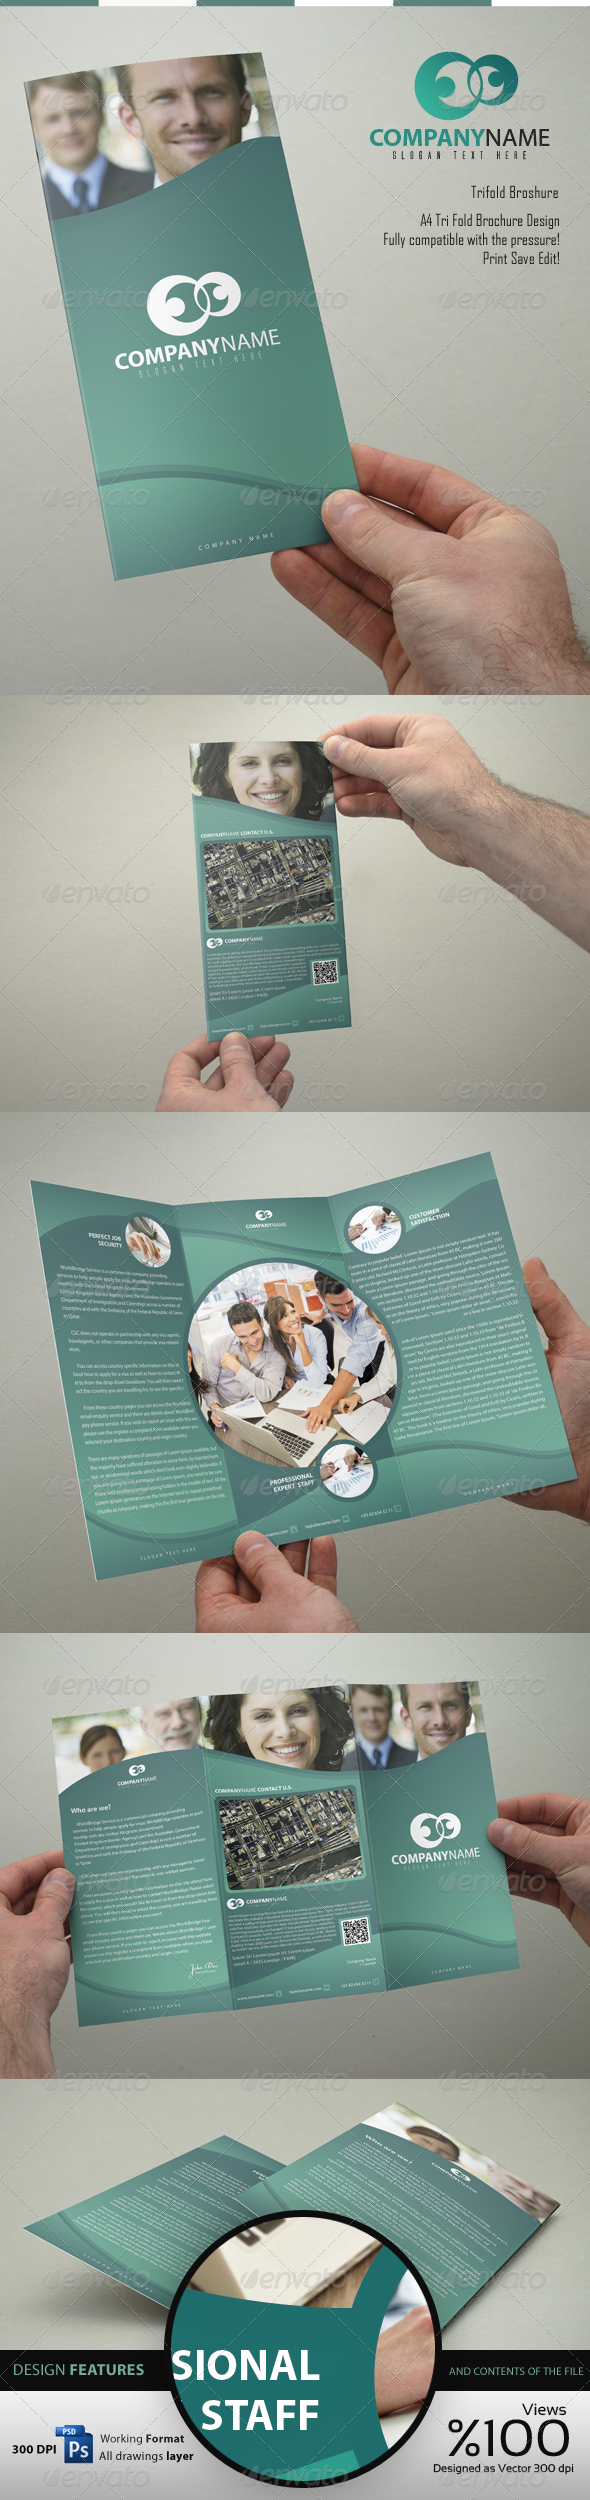 Company Trifold - 1 Brochure Design - Brochures Print Templates